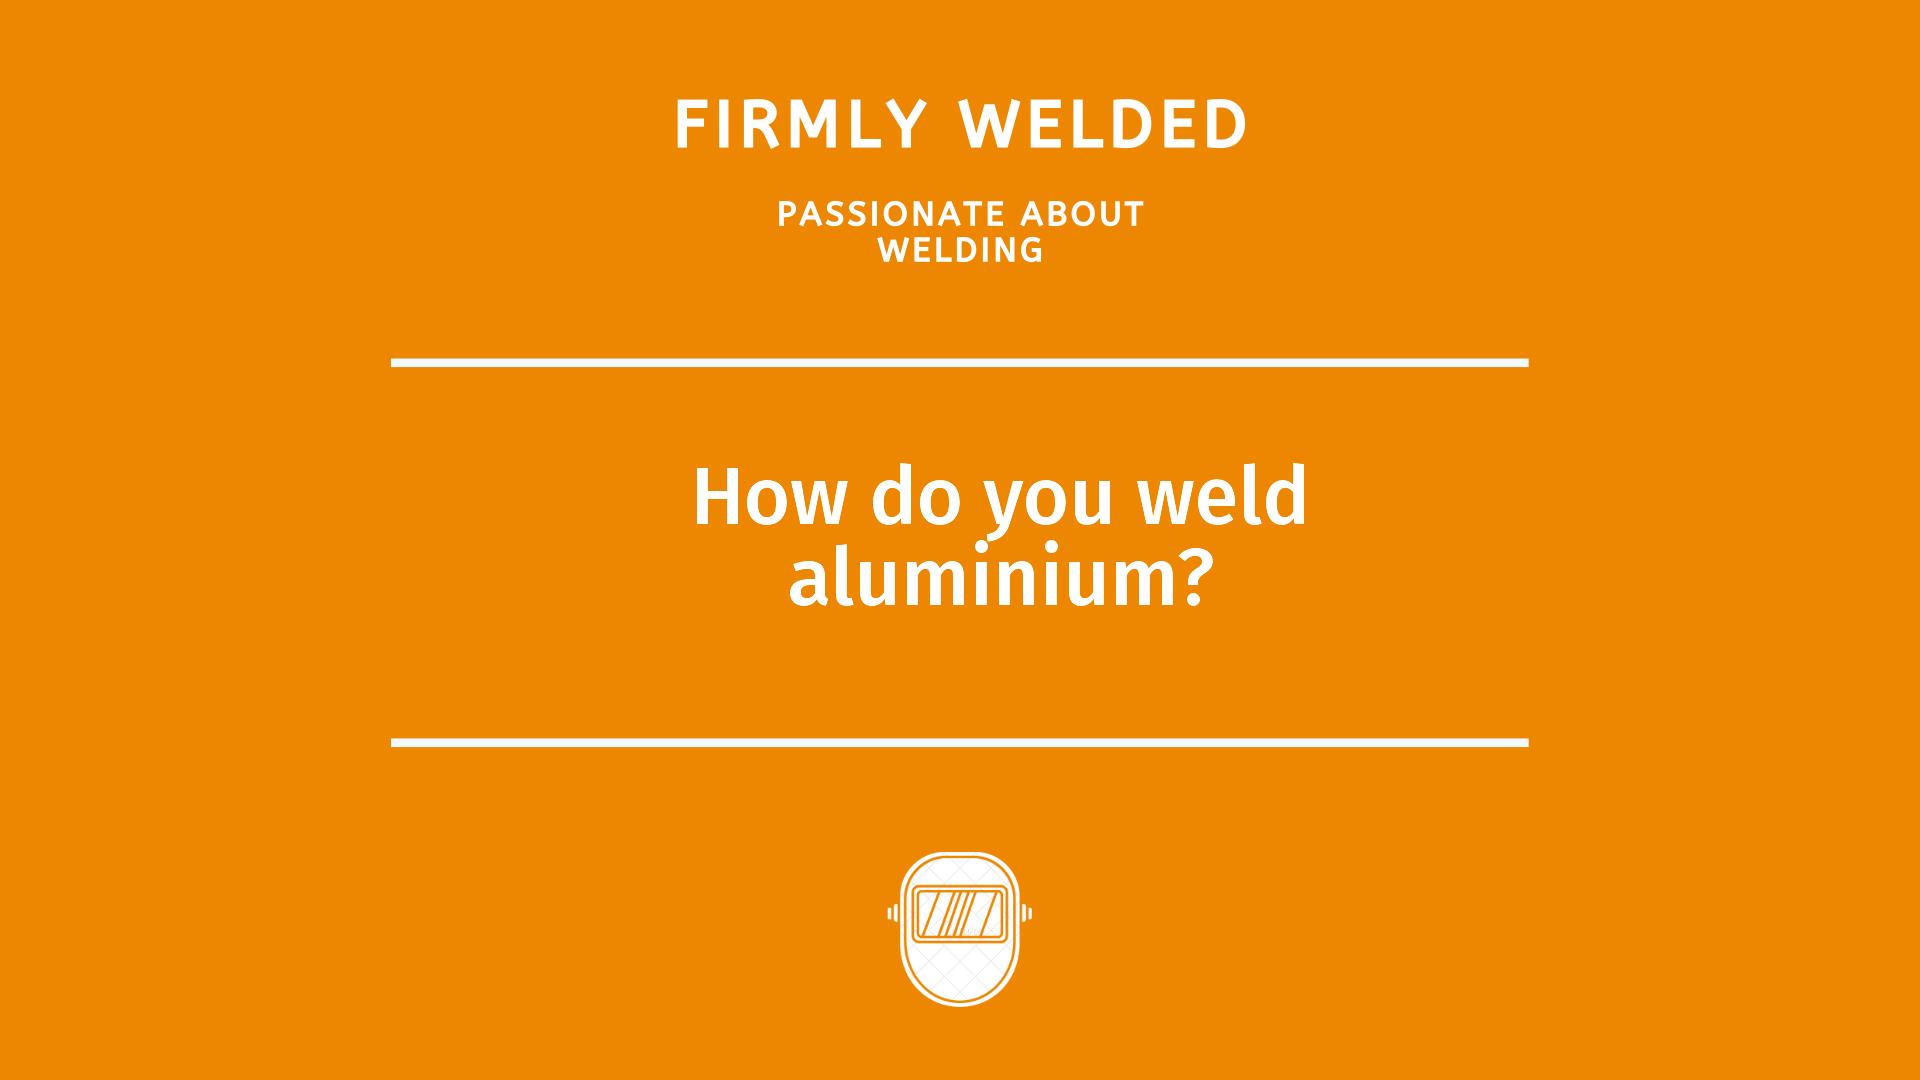 How do you weld aluminium?